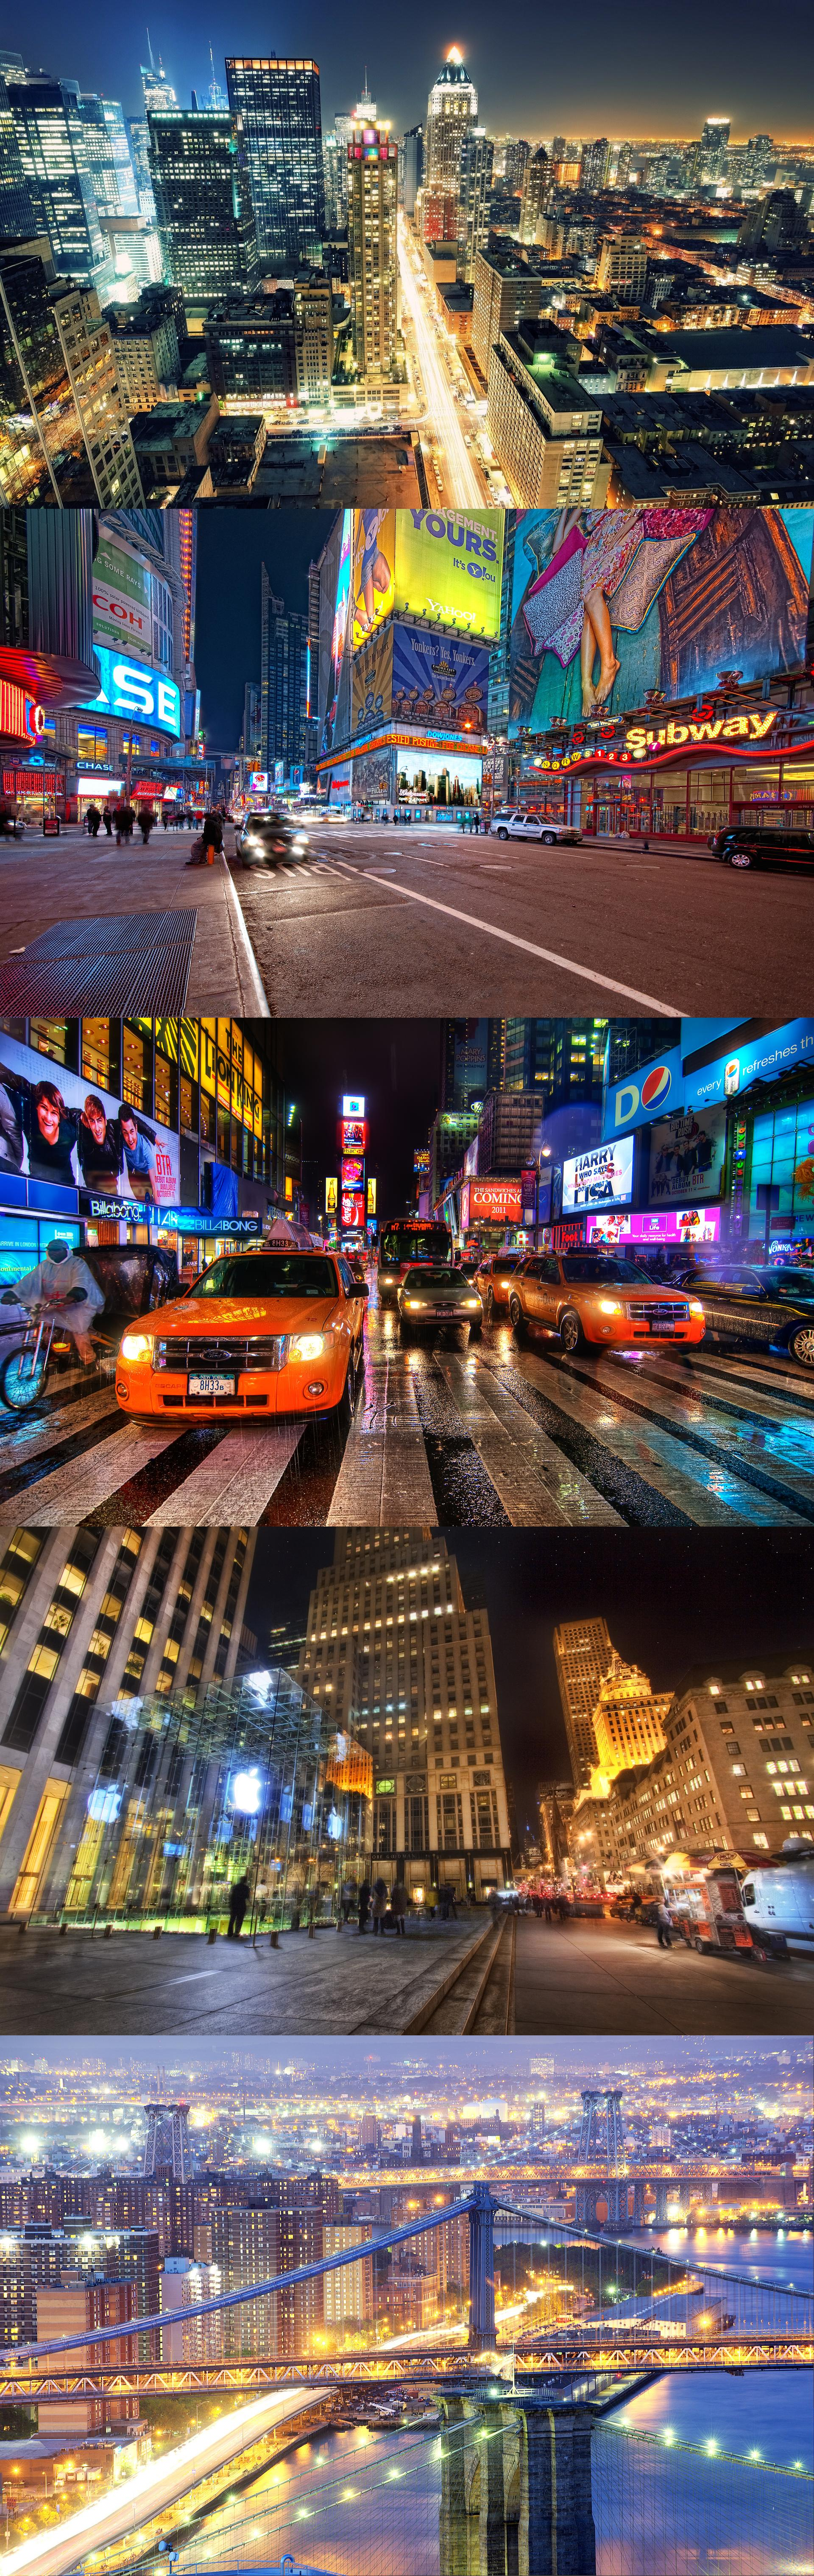 Times square, night, new york city, nyc, usa, 8th avenue ...